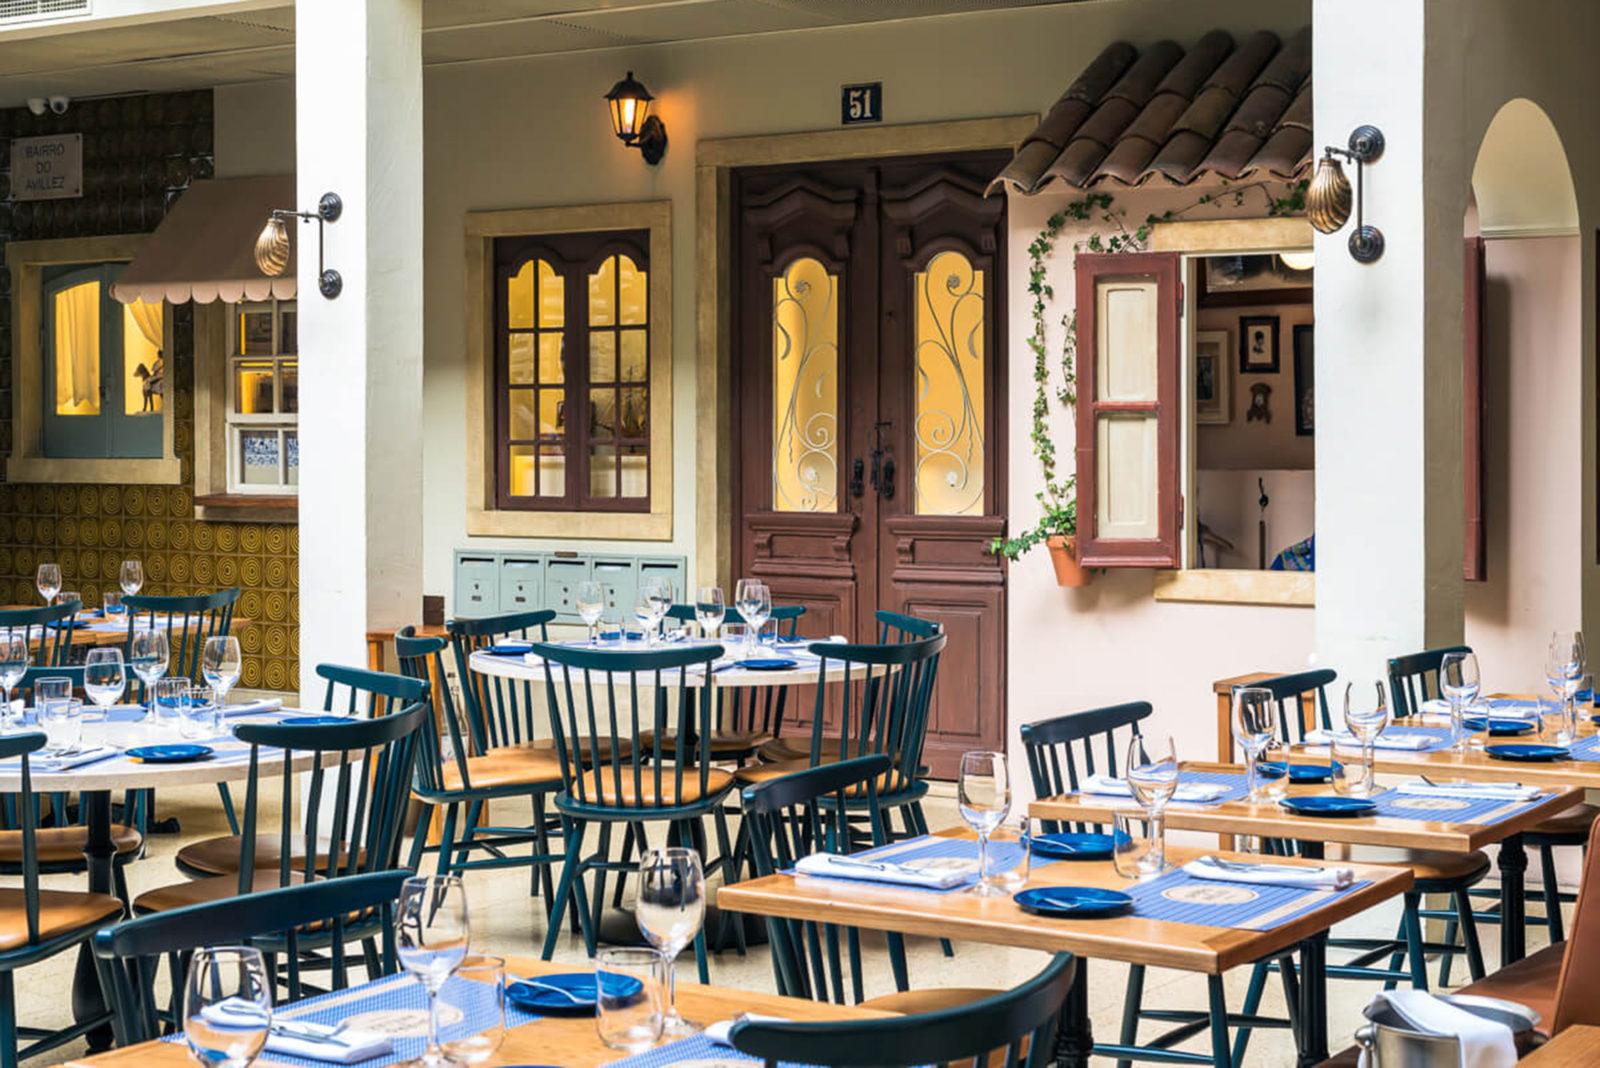 Bairro do Avillez restaurant featuring Joana's Walls have Ears installation.